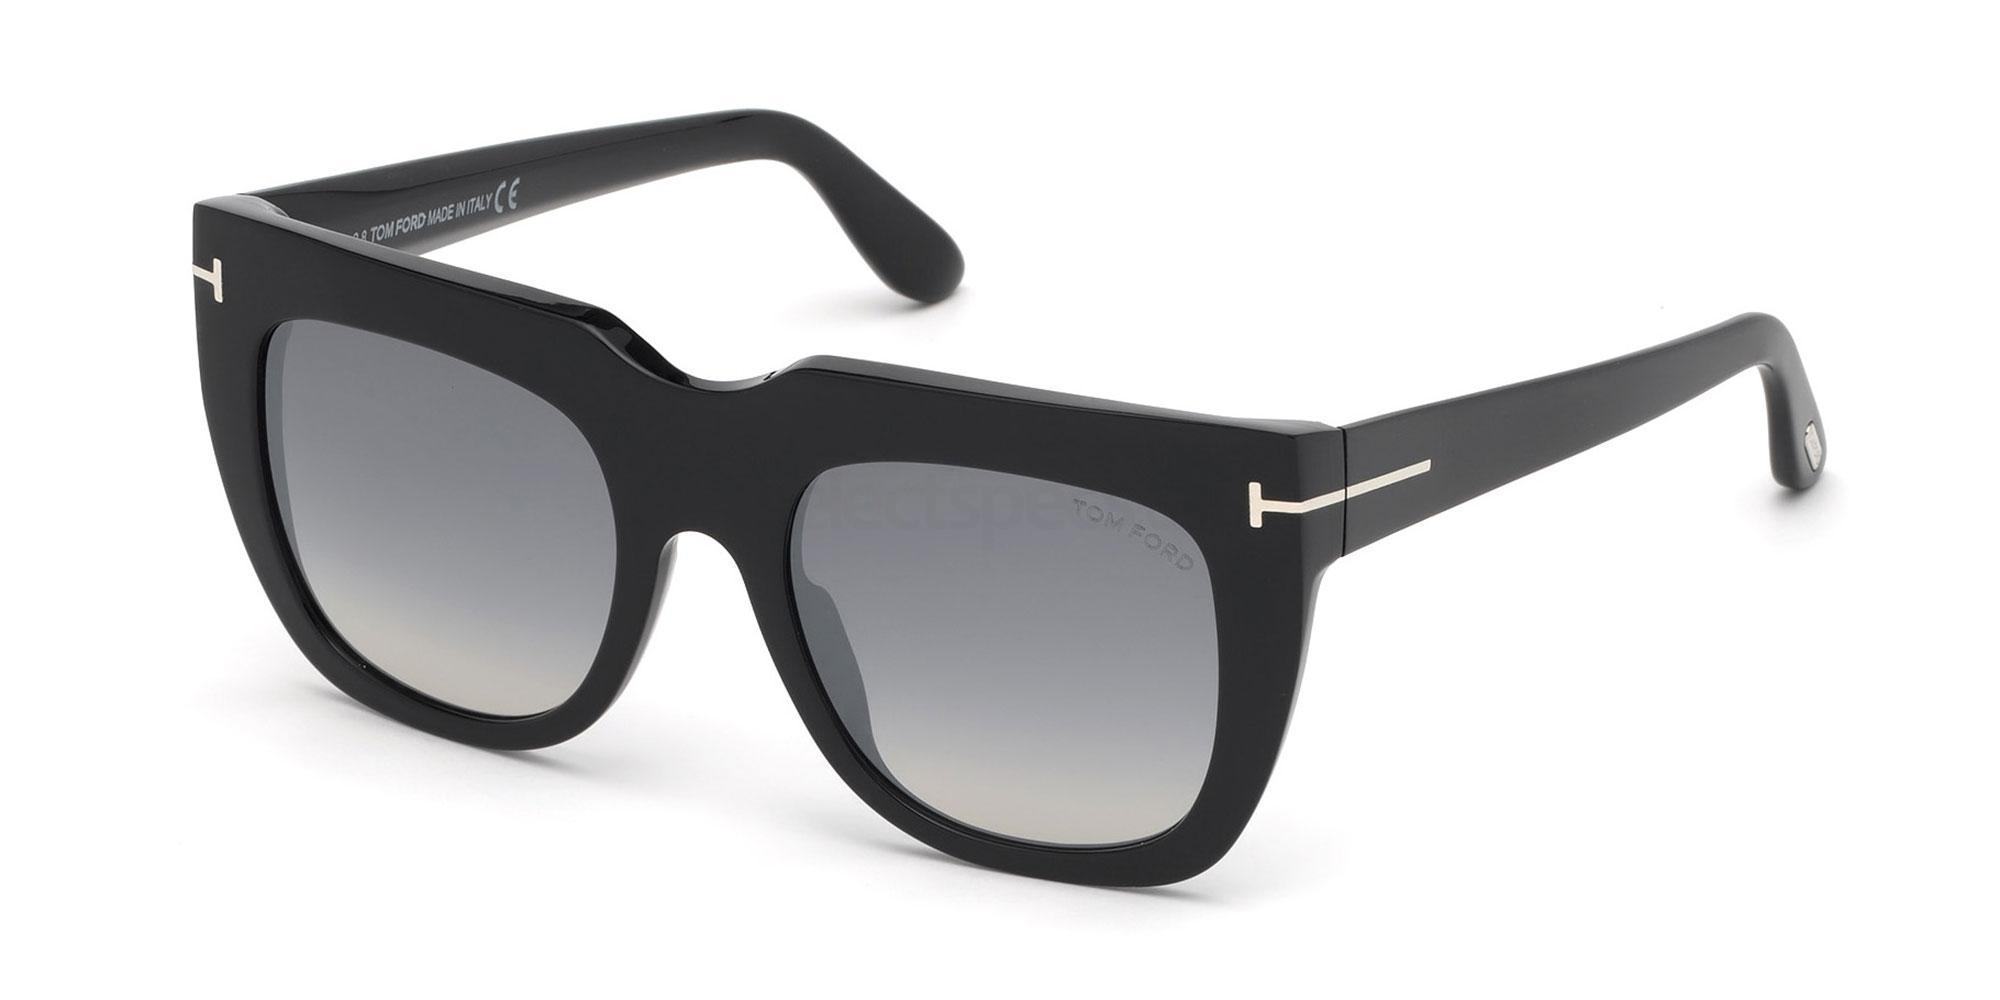 01C FT0687 Sunglasses, Tom Ford